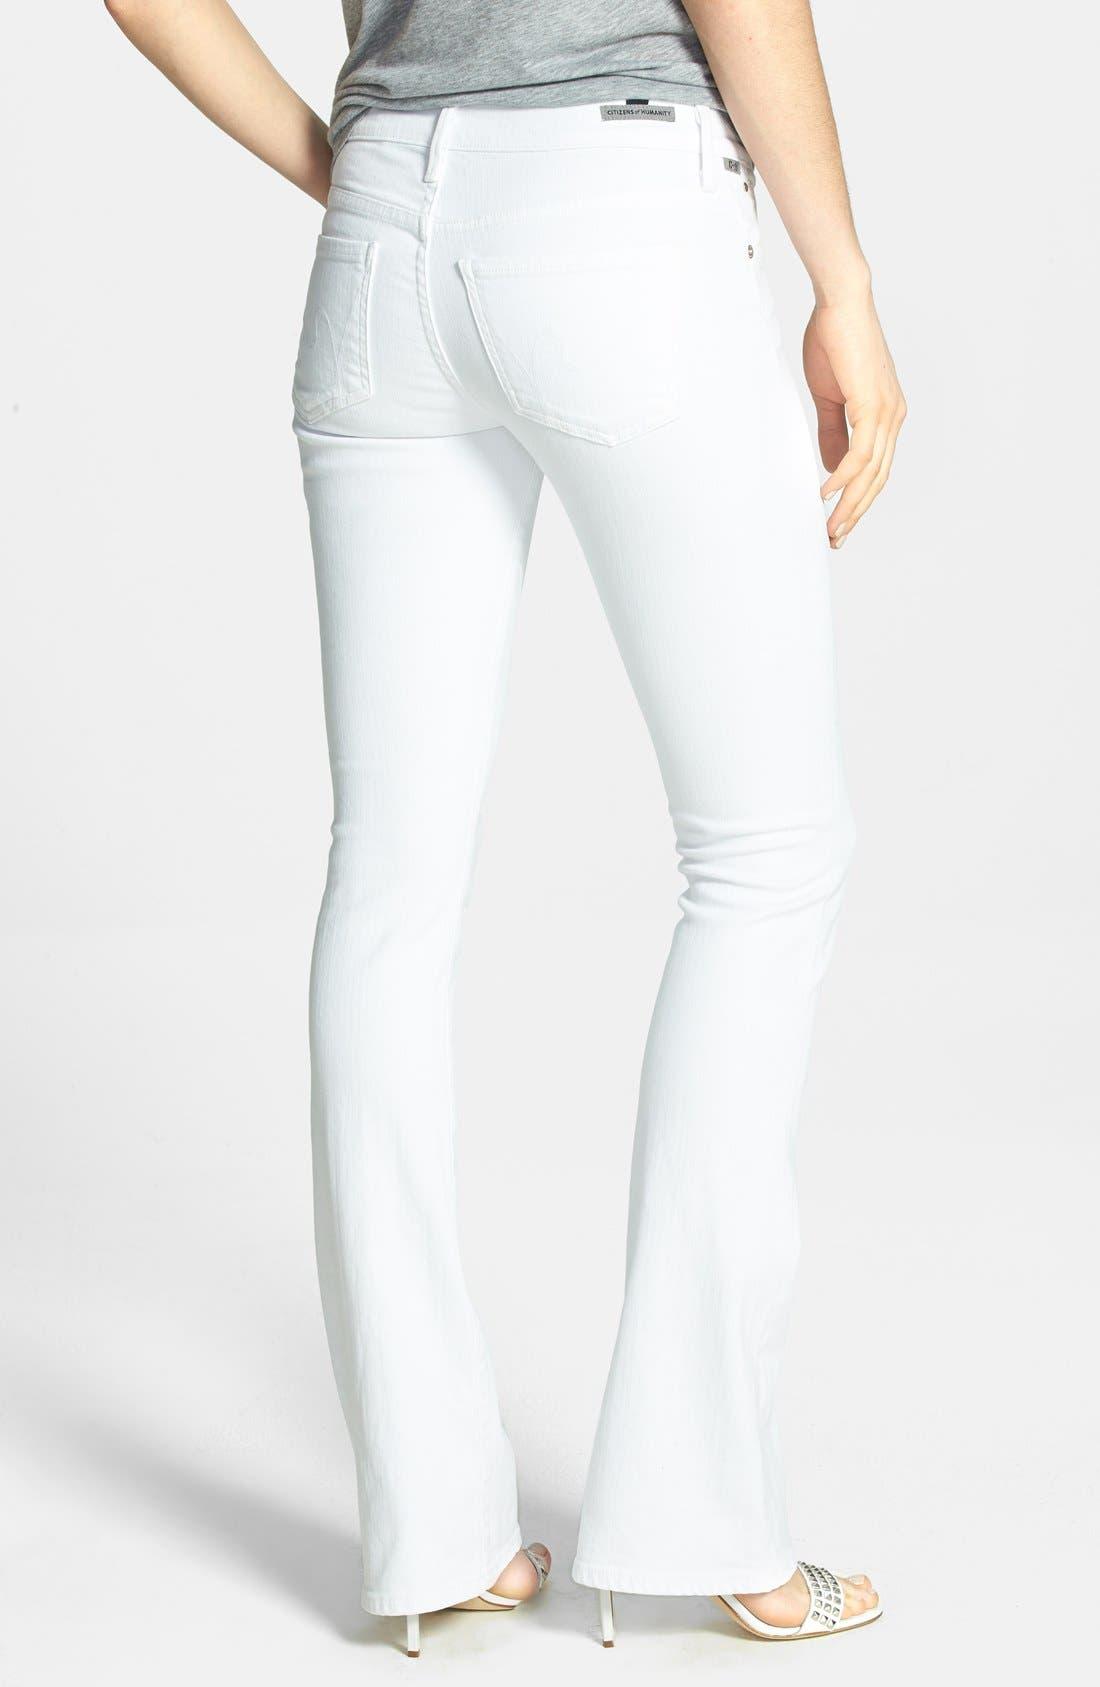 'Emannuelle' Slim Bootcut Jeans,                             Alternate thumbnail 2, color,                             Optic White